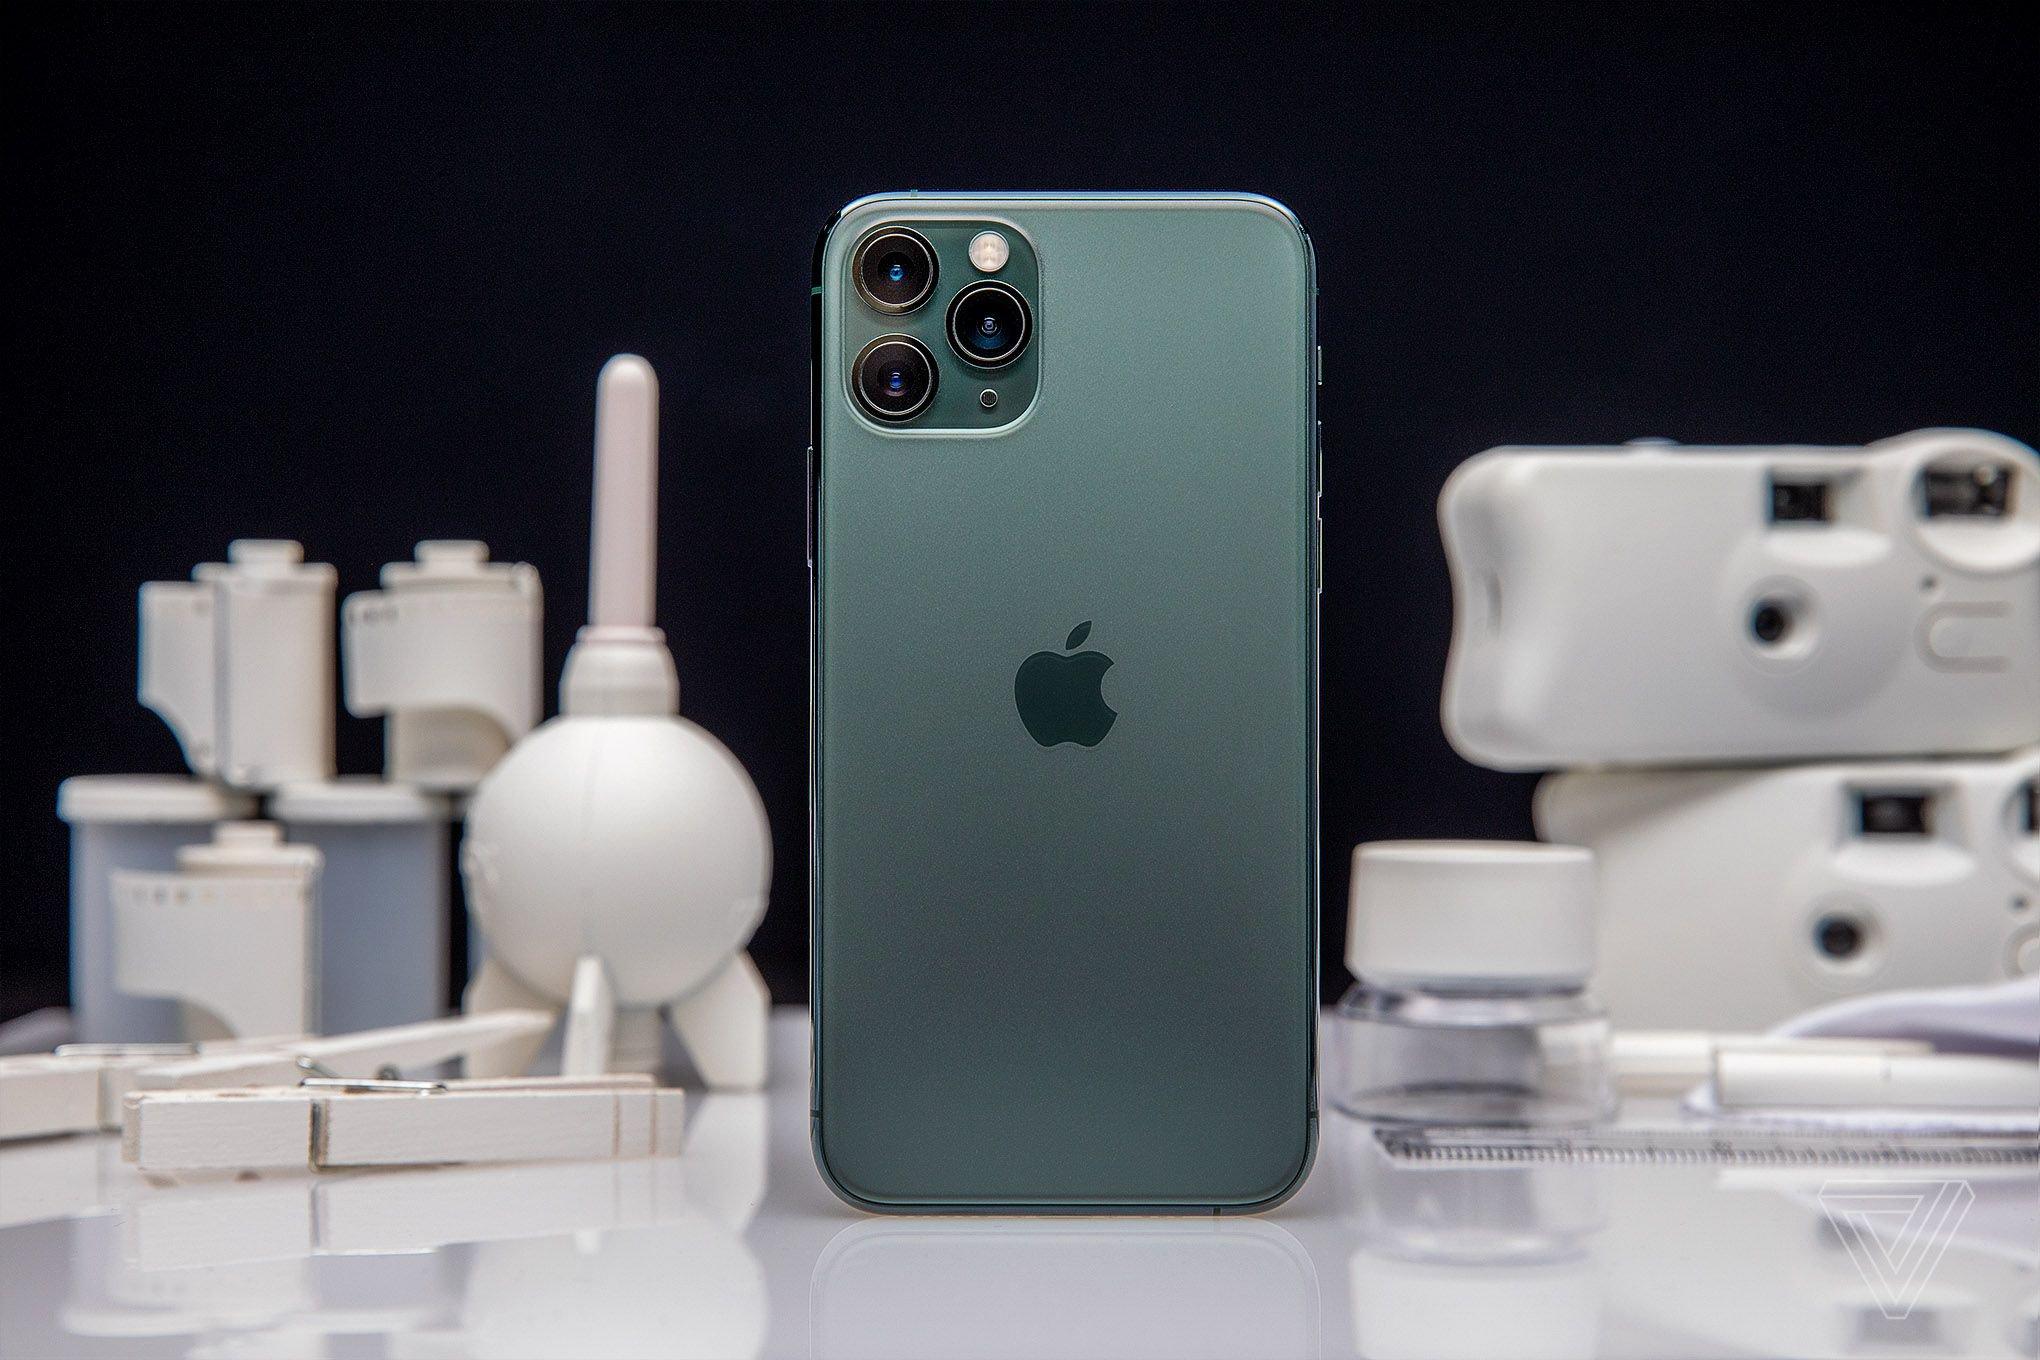 айфон 11 про макс 512 темно-зеленый